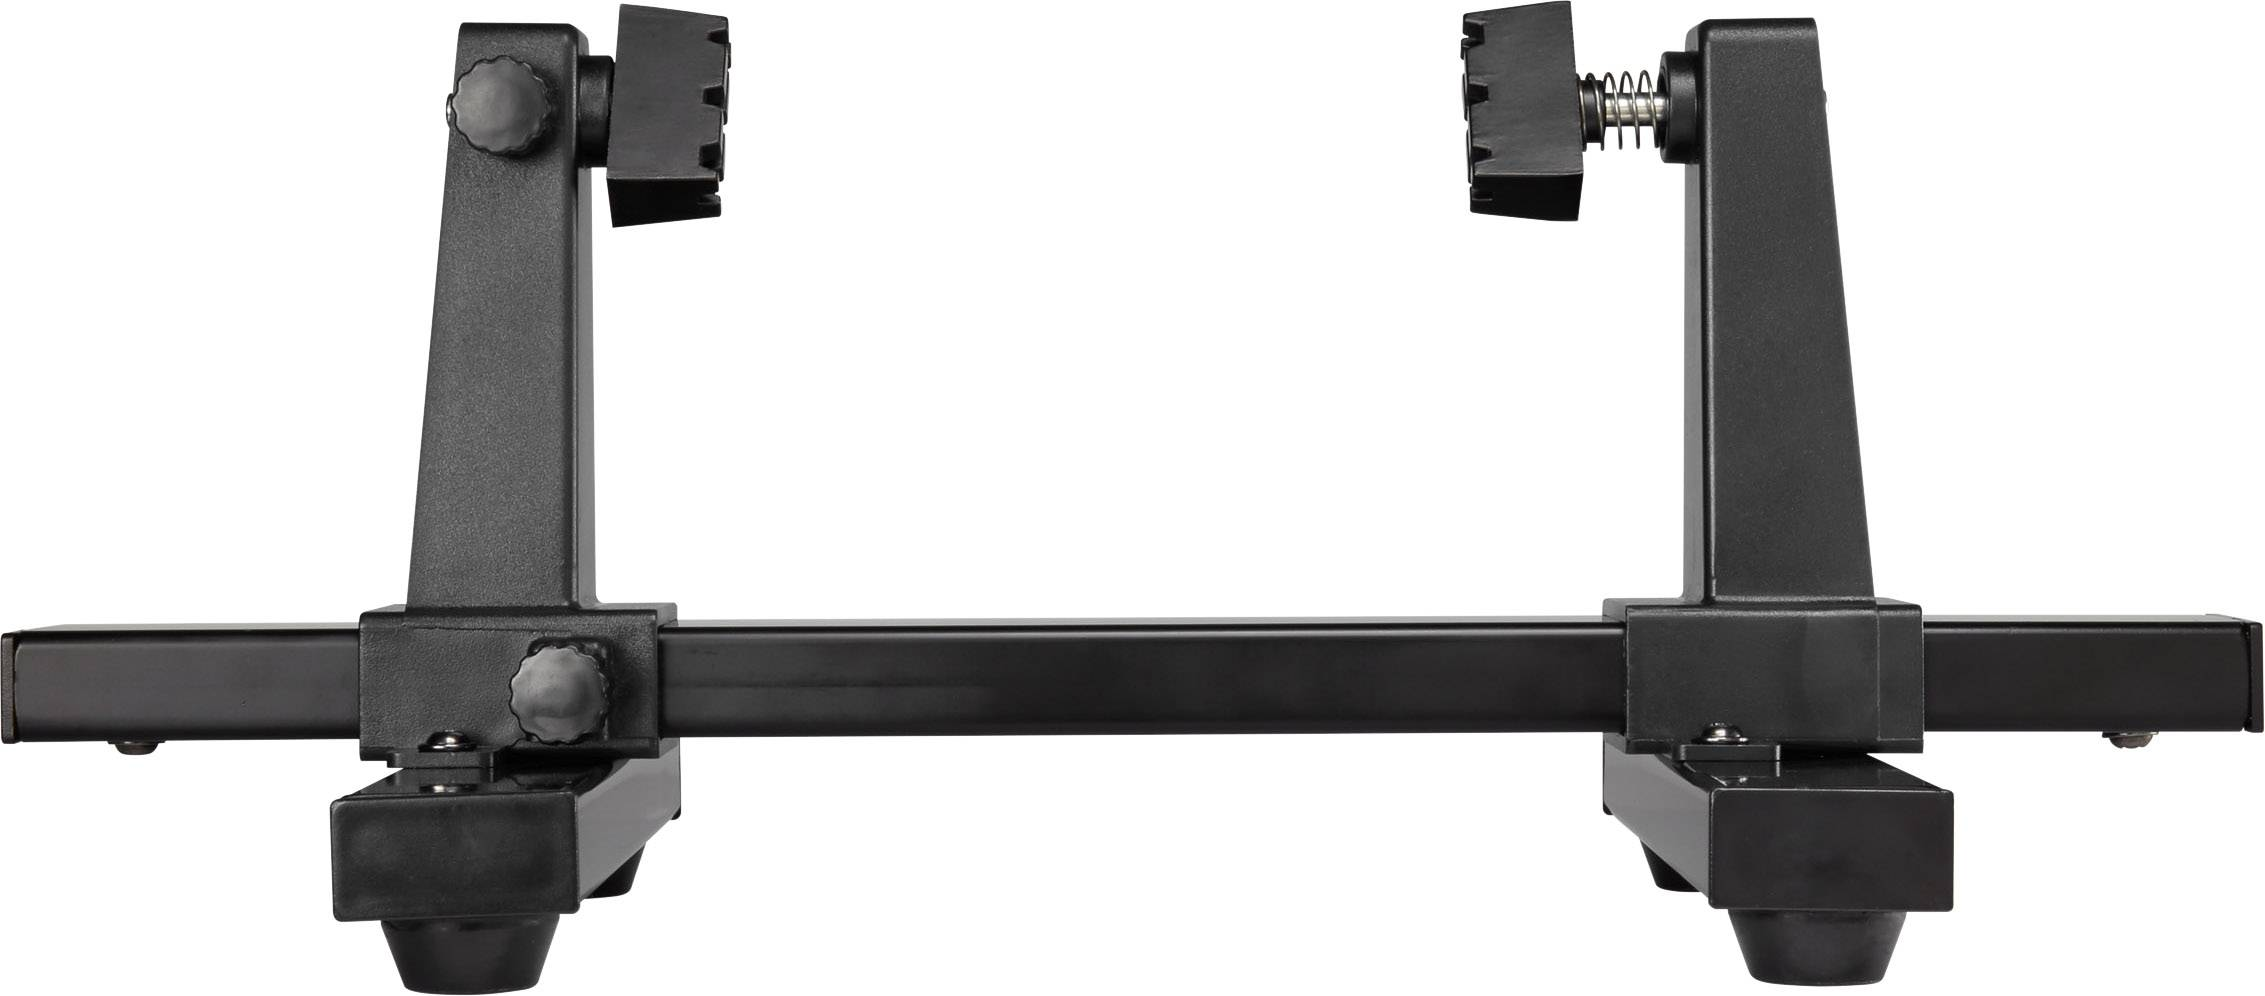 Držák pro DPS TOOLCRAFT 1372161, (d x š x v) 165 x 330 x 125 mm, 1 ks